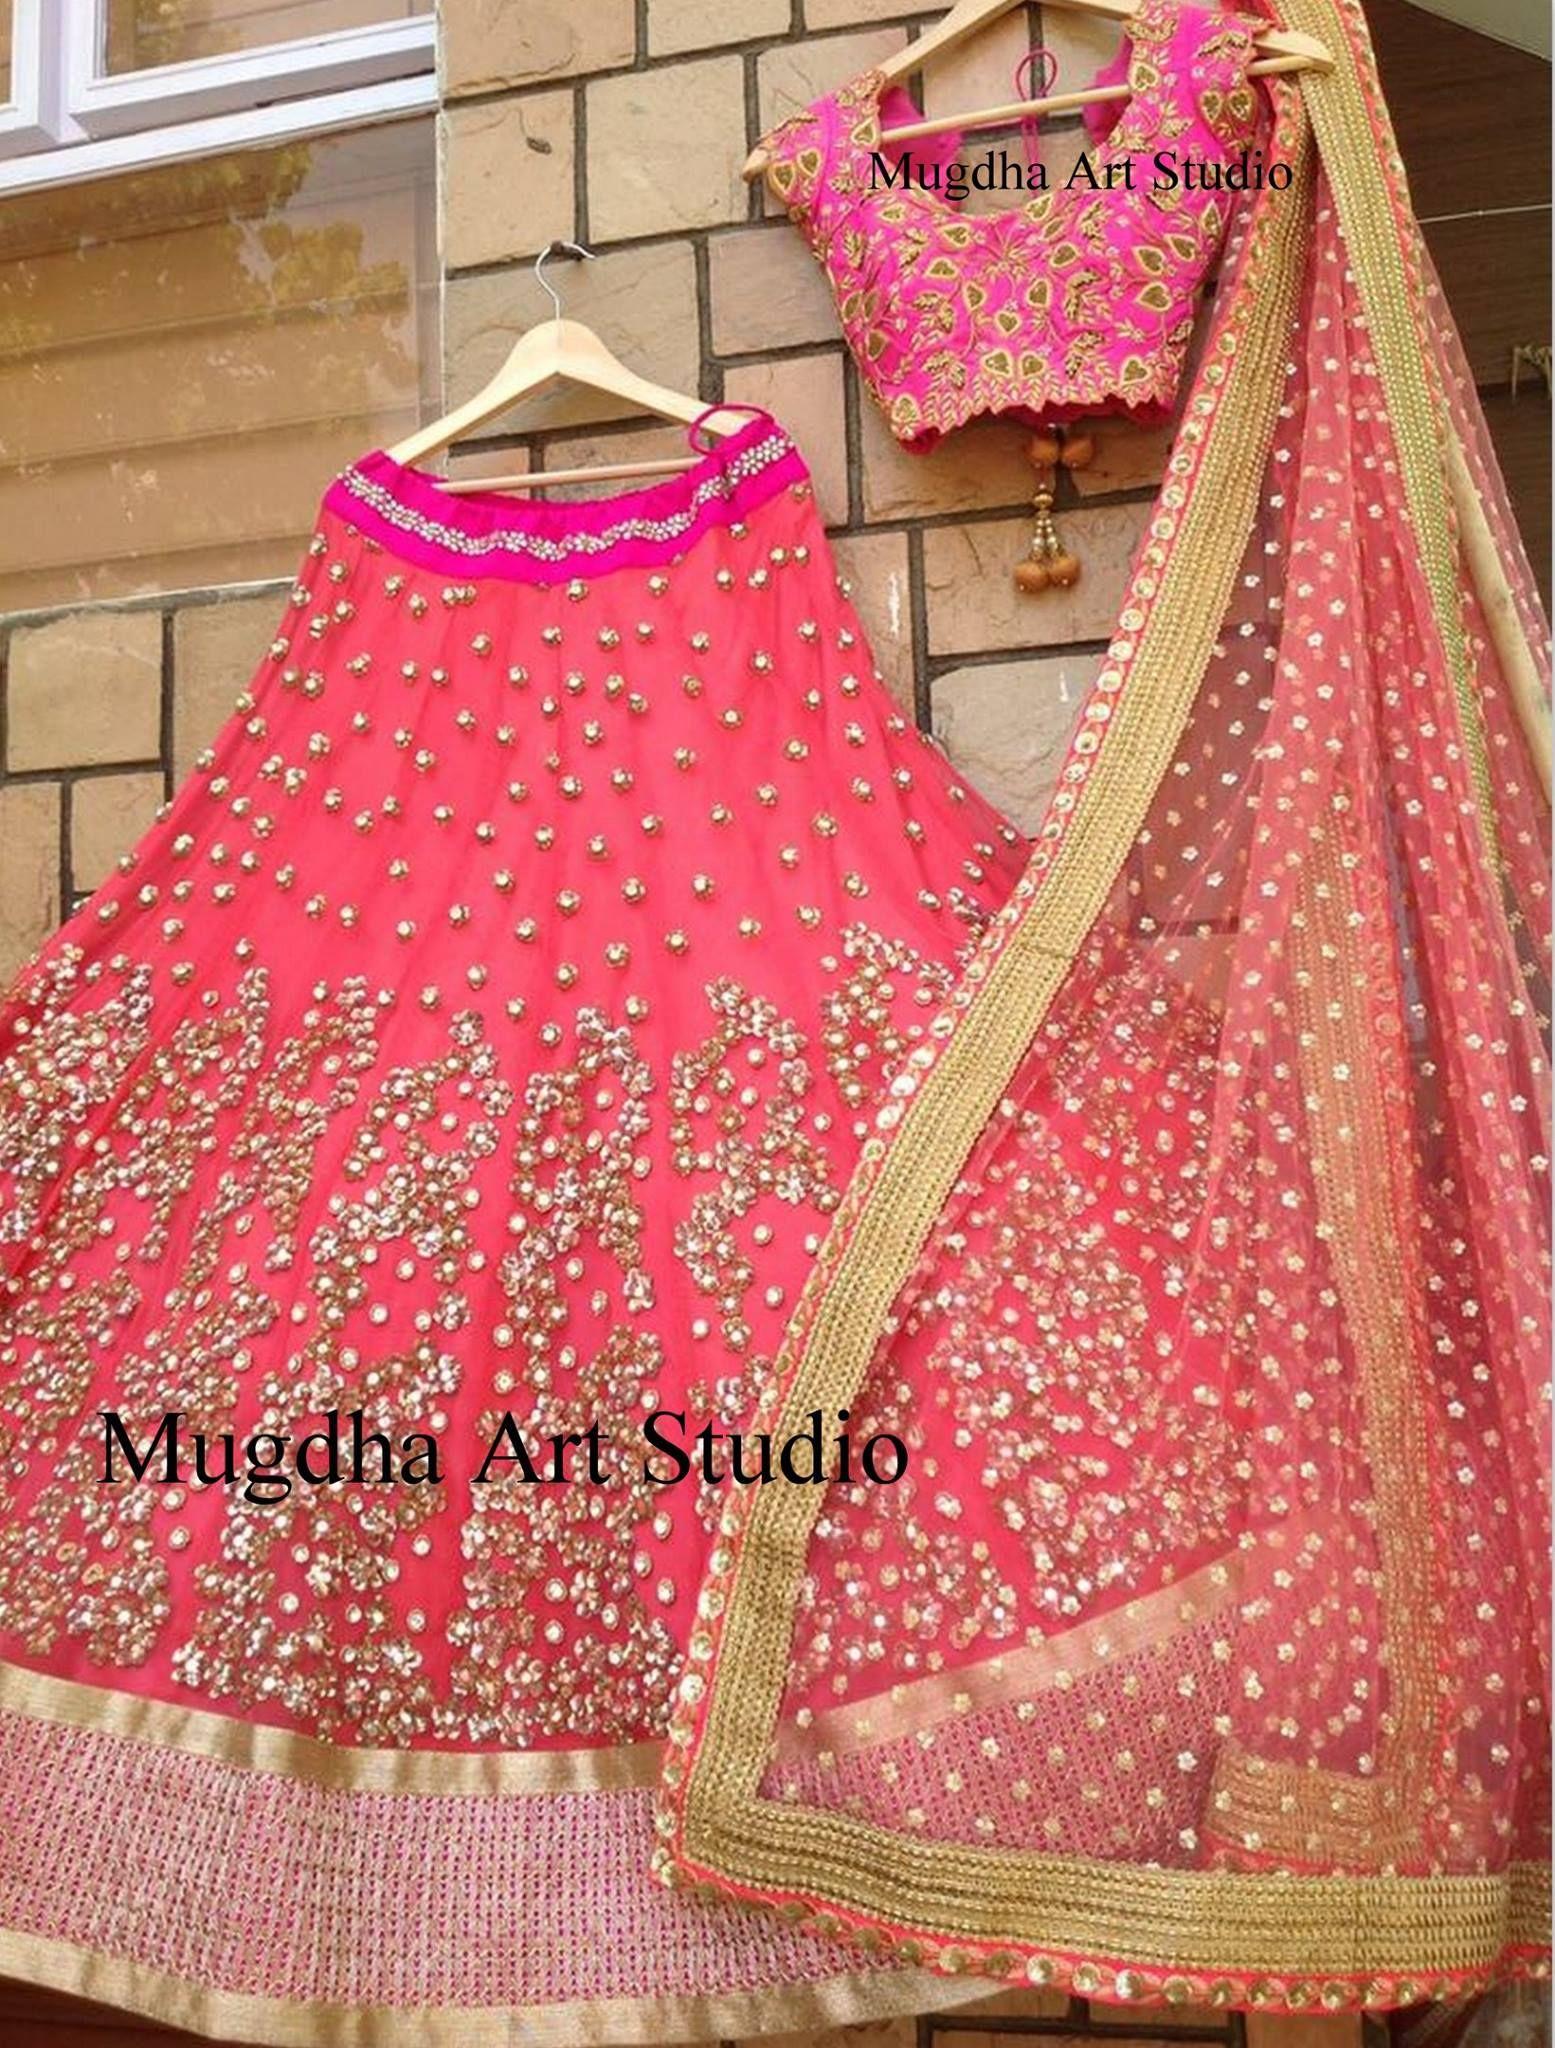 Half saree blouse design indian pink wedding or special occasions attire  creative ideas